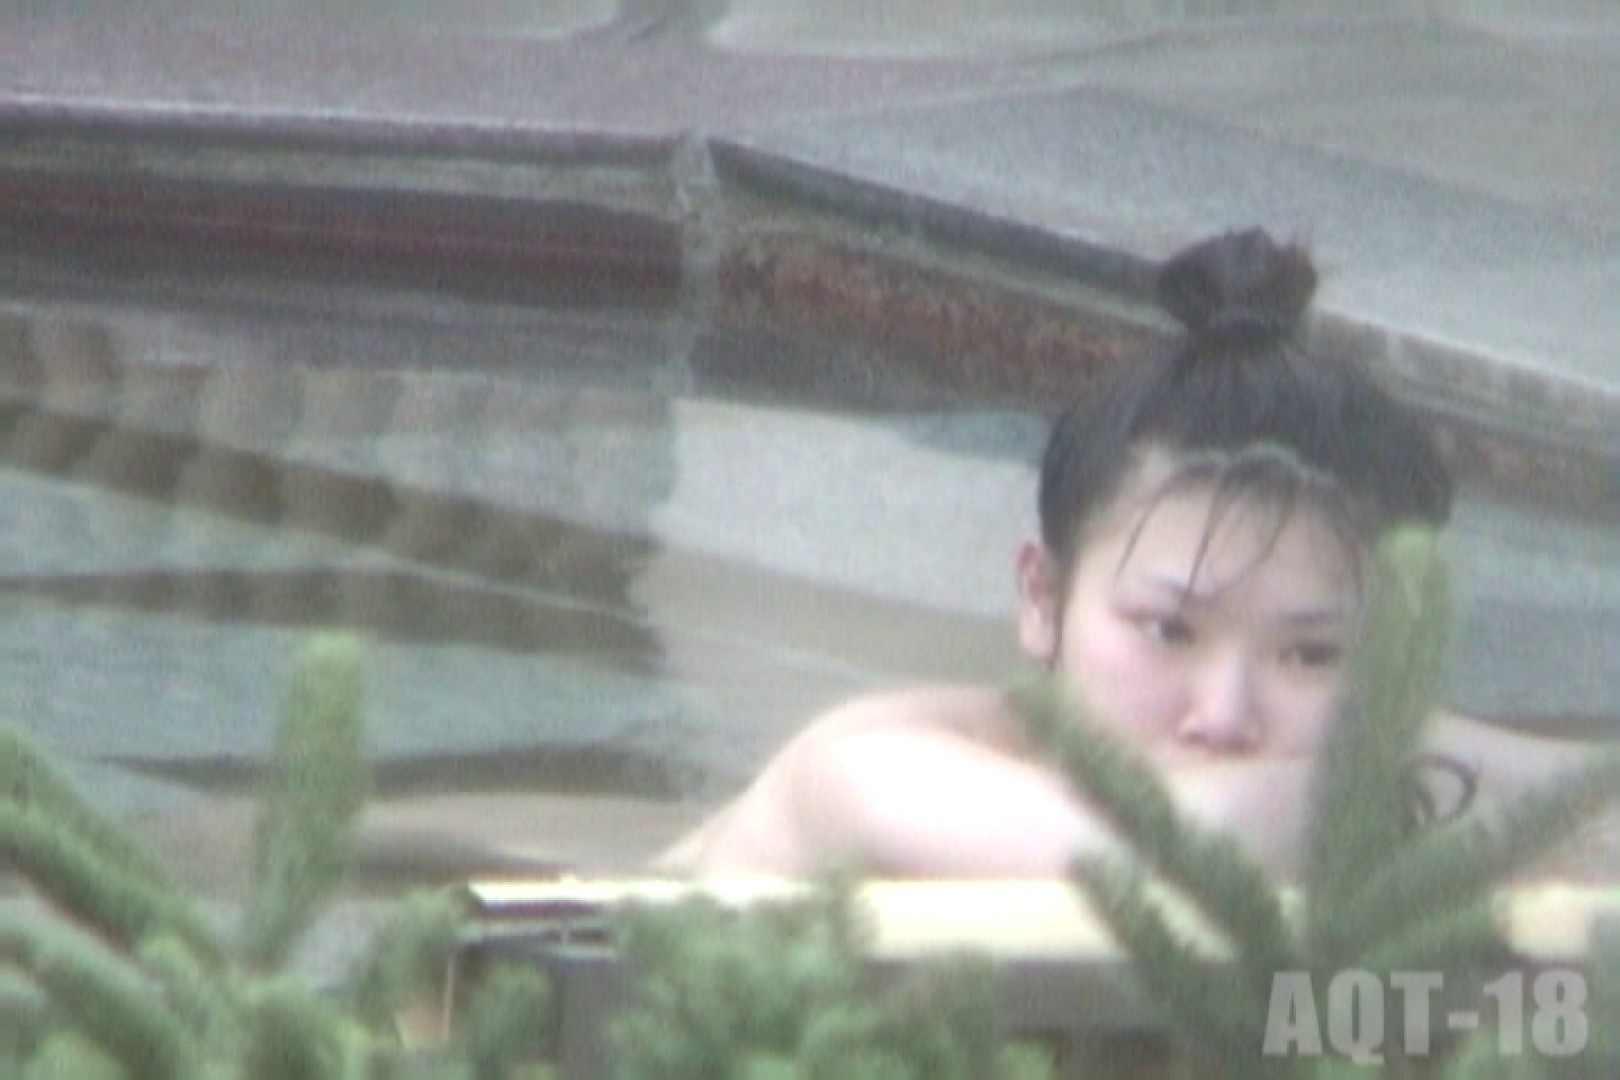 Aquaな露天風呂Vol.855 露天 | OLセックス  67画像 19